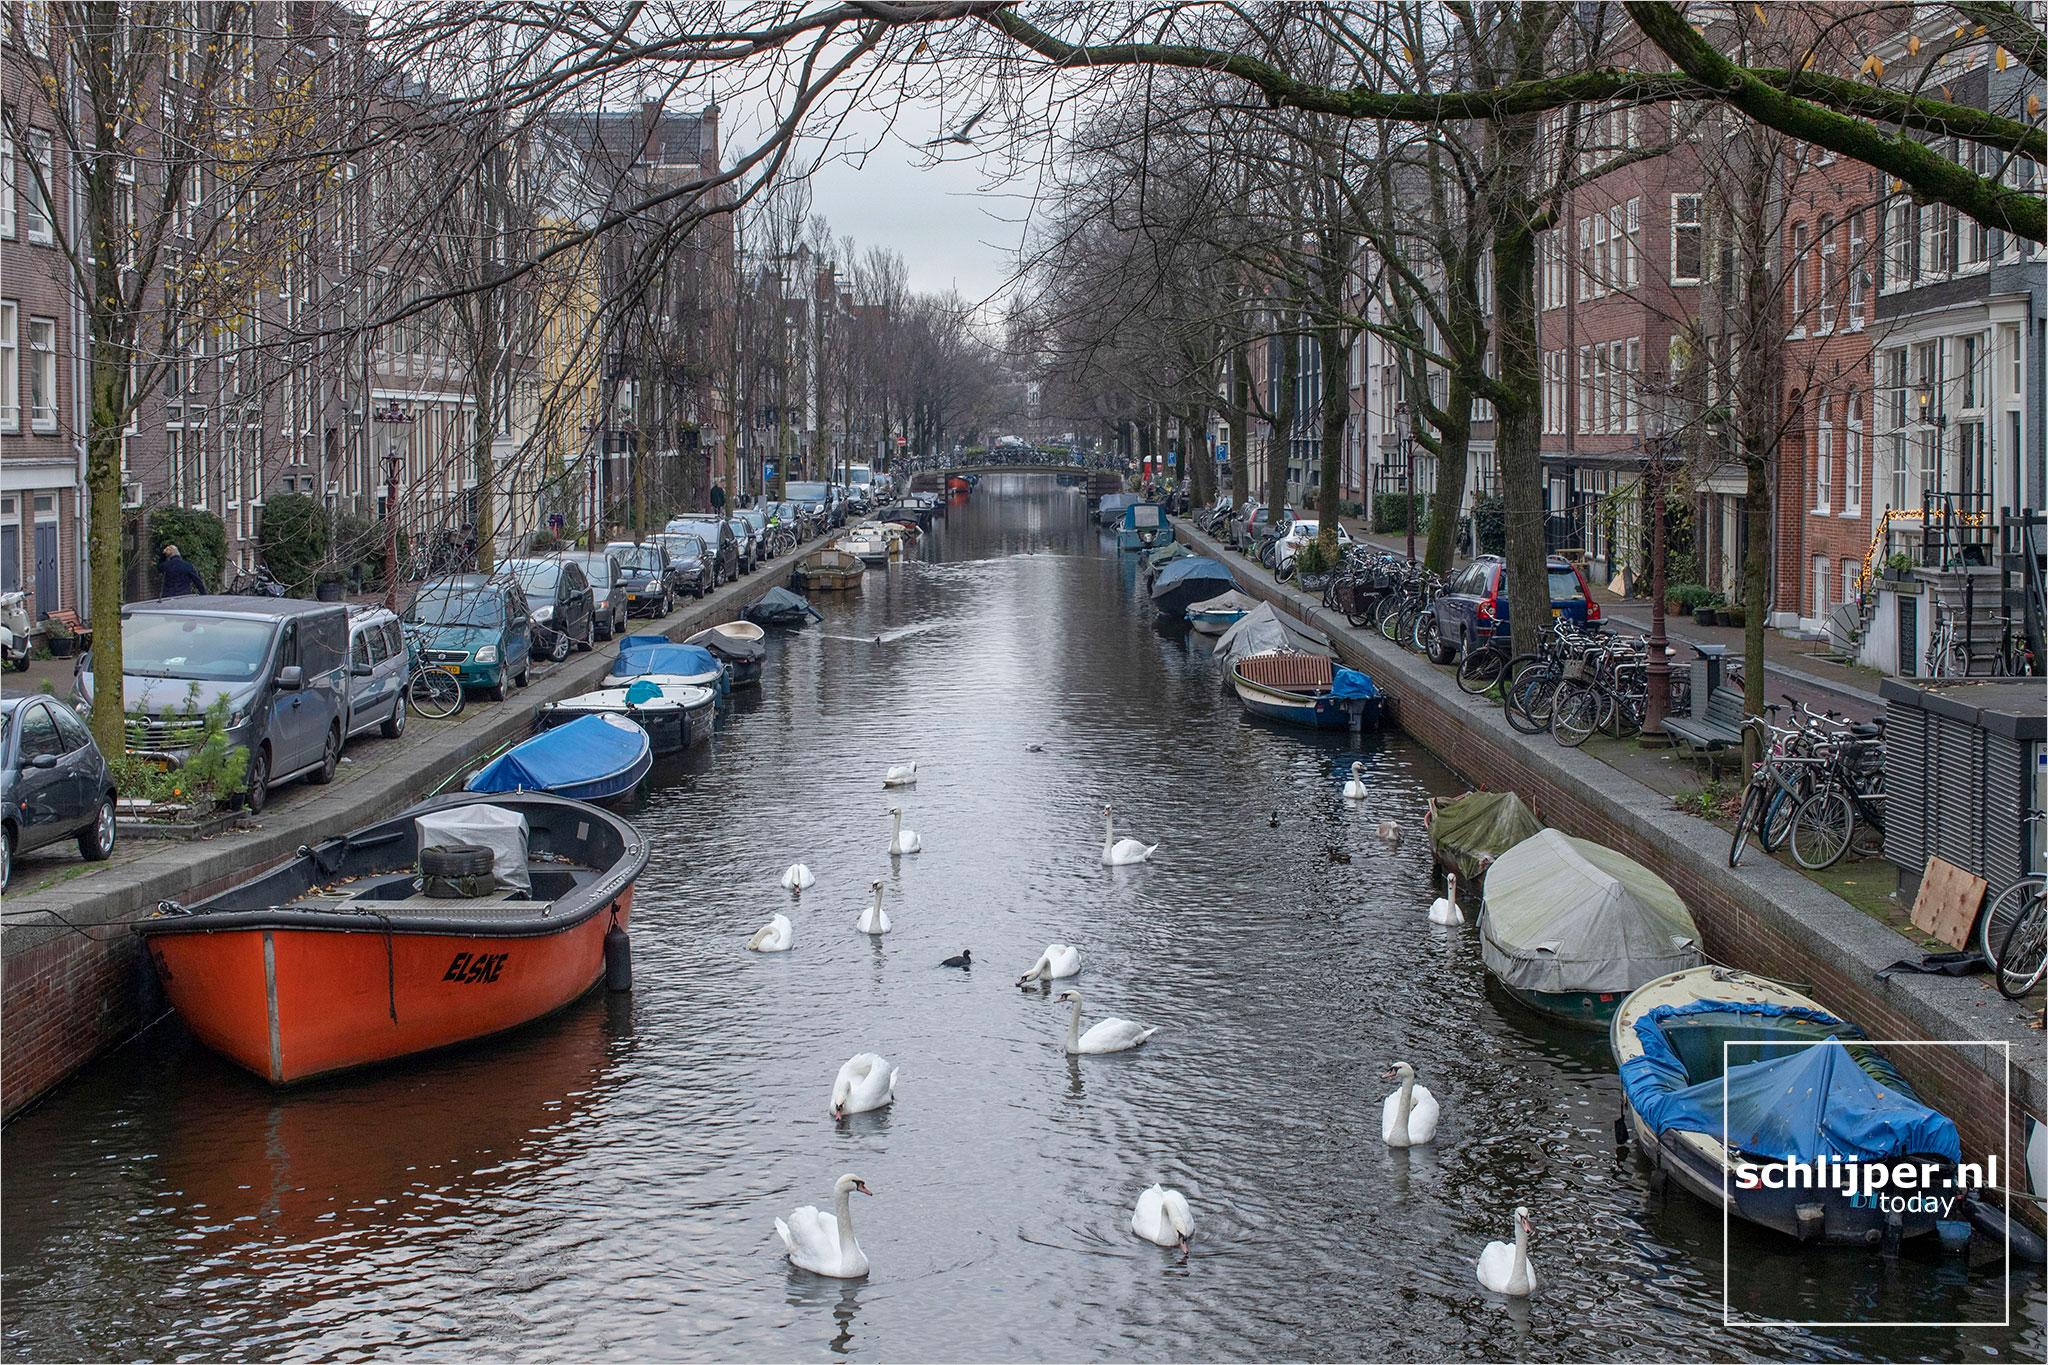 The Netherlands, Amsterdam, 15 december 2020